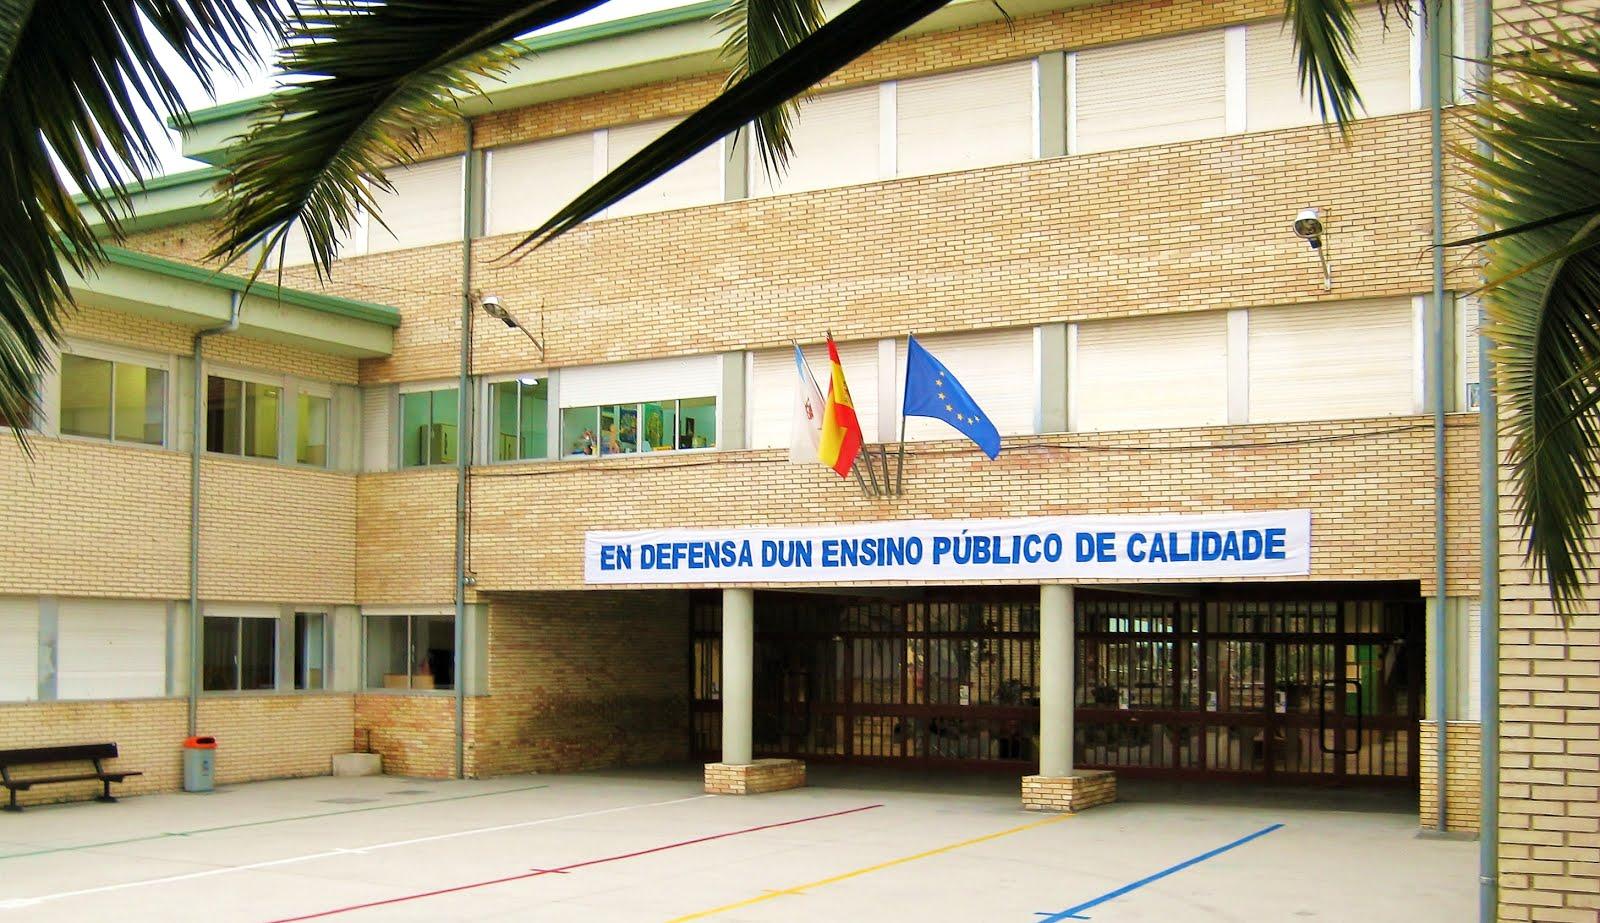 CEIP P. ALBINO NÚÑEZ